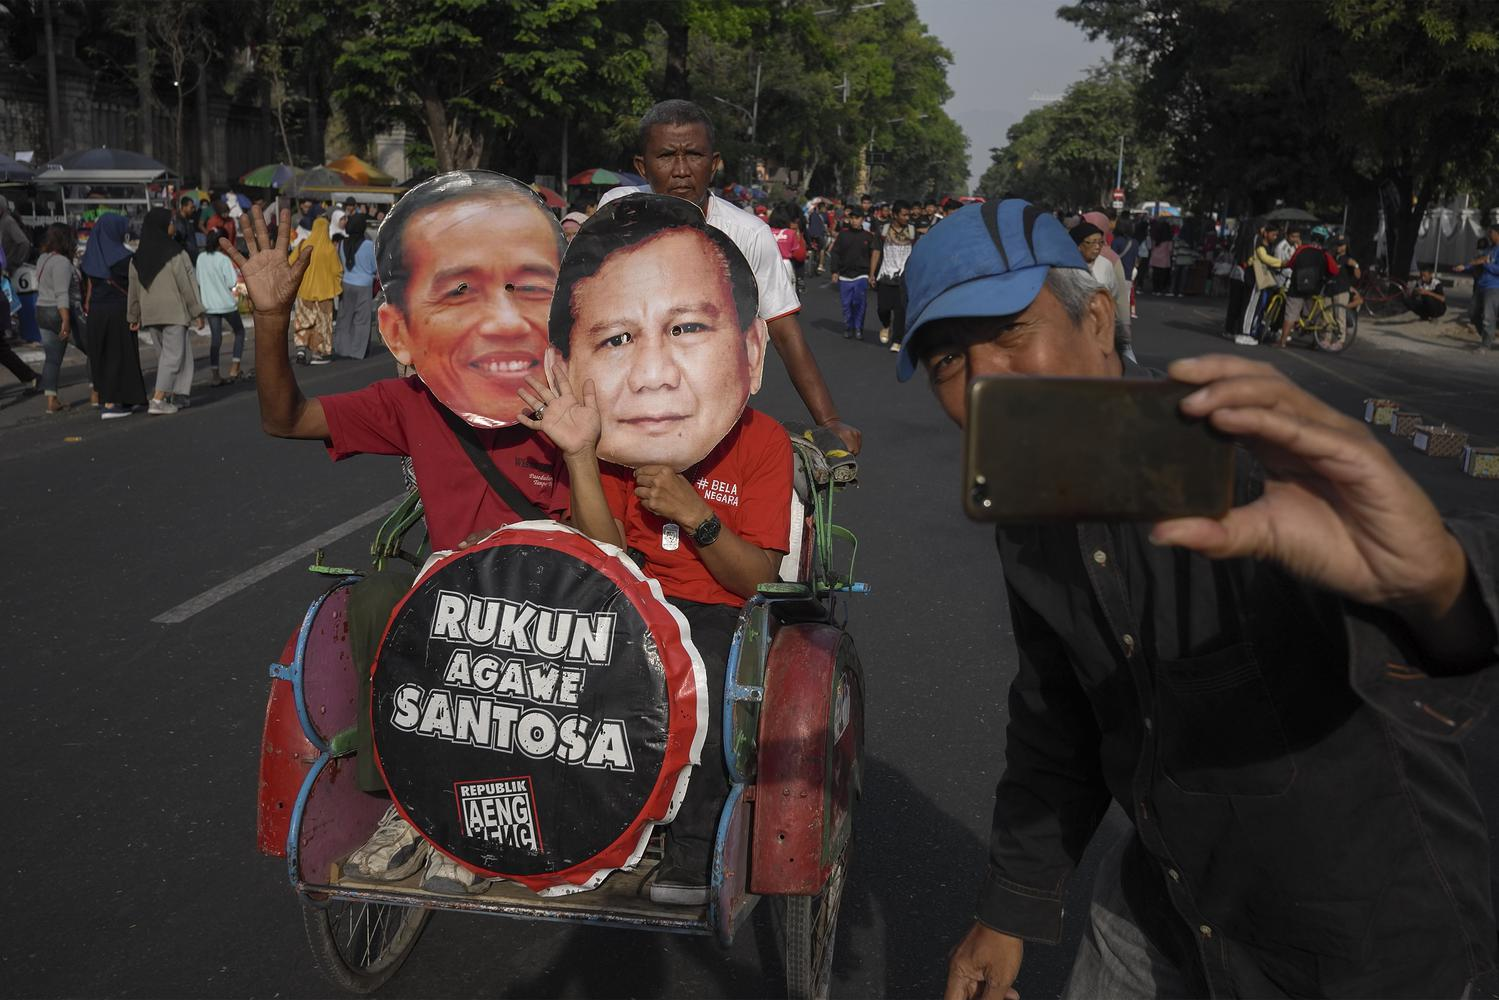 Ada andil Presiden Jokowi dalam koalisi PDIP dan Gerindra di Pilkada 2020. Pengamat pun menilainya sebagai wujug pragmatisme politik masih kuat dan mandeknya kaderisasi partai.